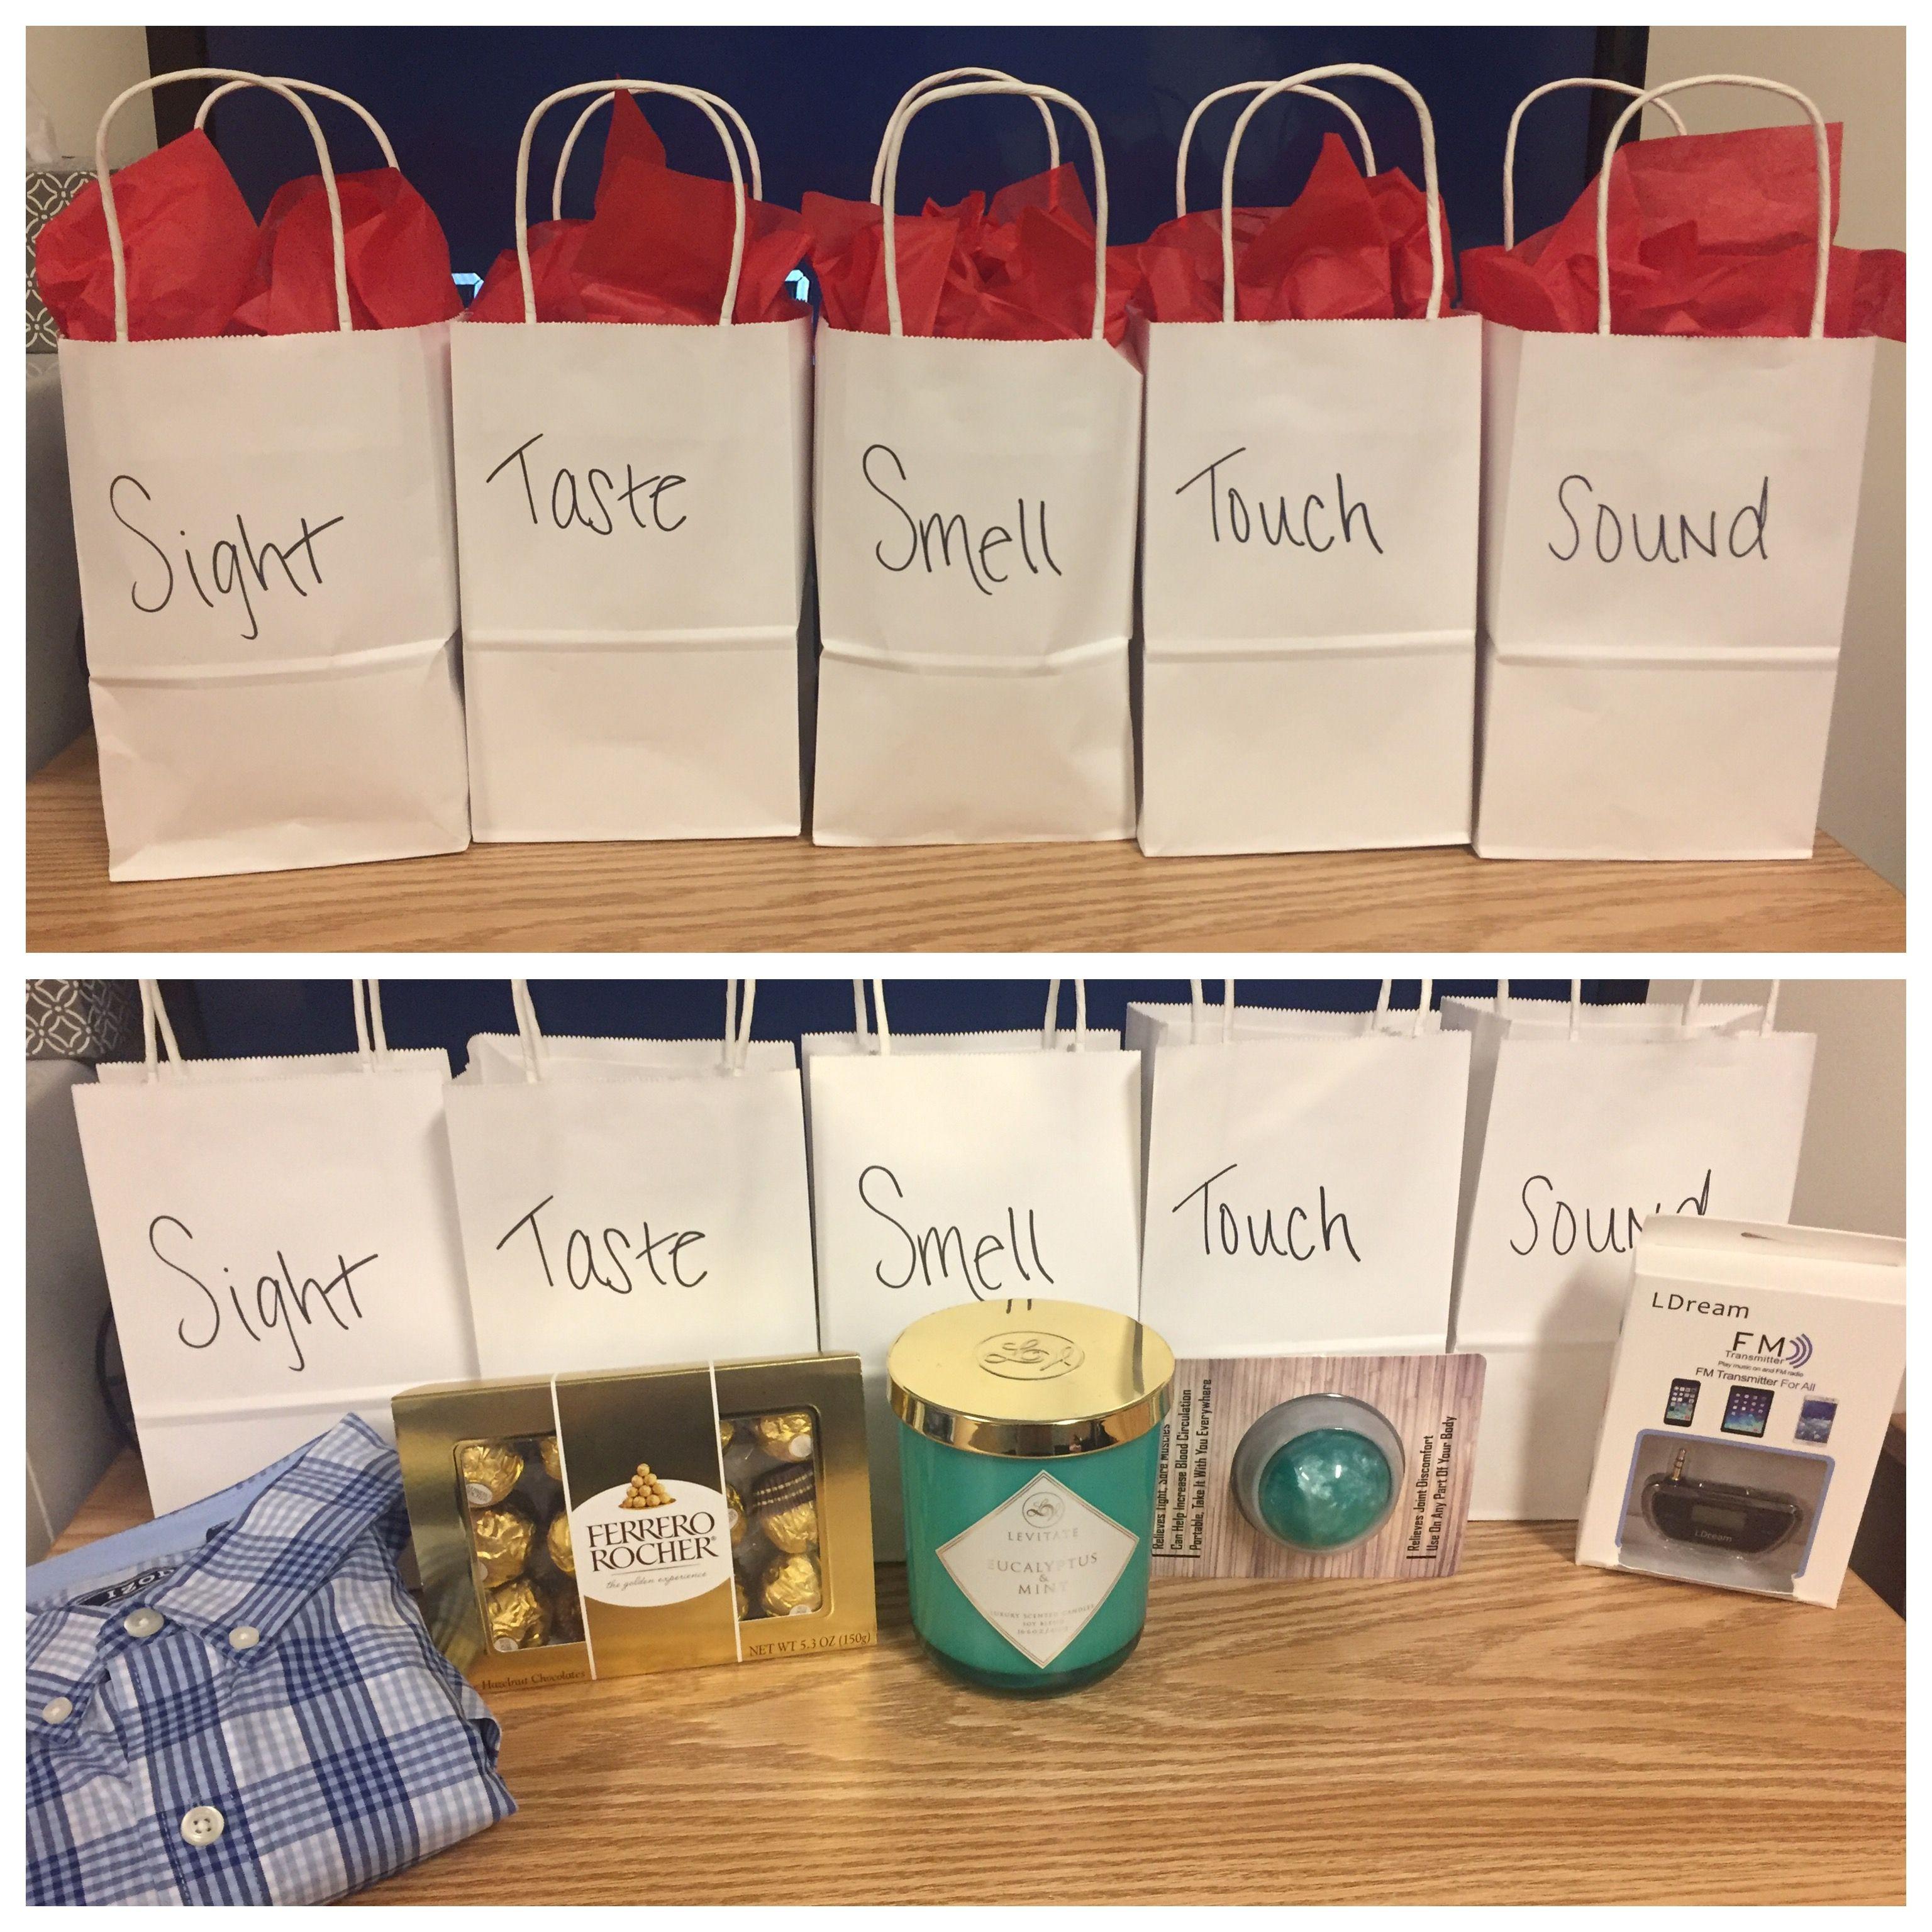 5 senses gift for him valentines 5senses diy gifts for